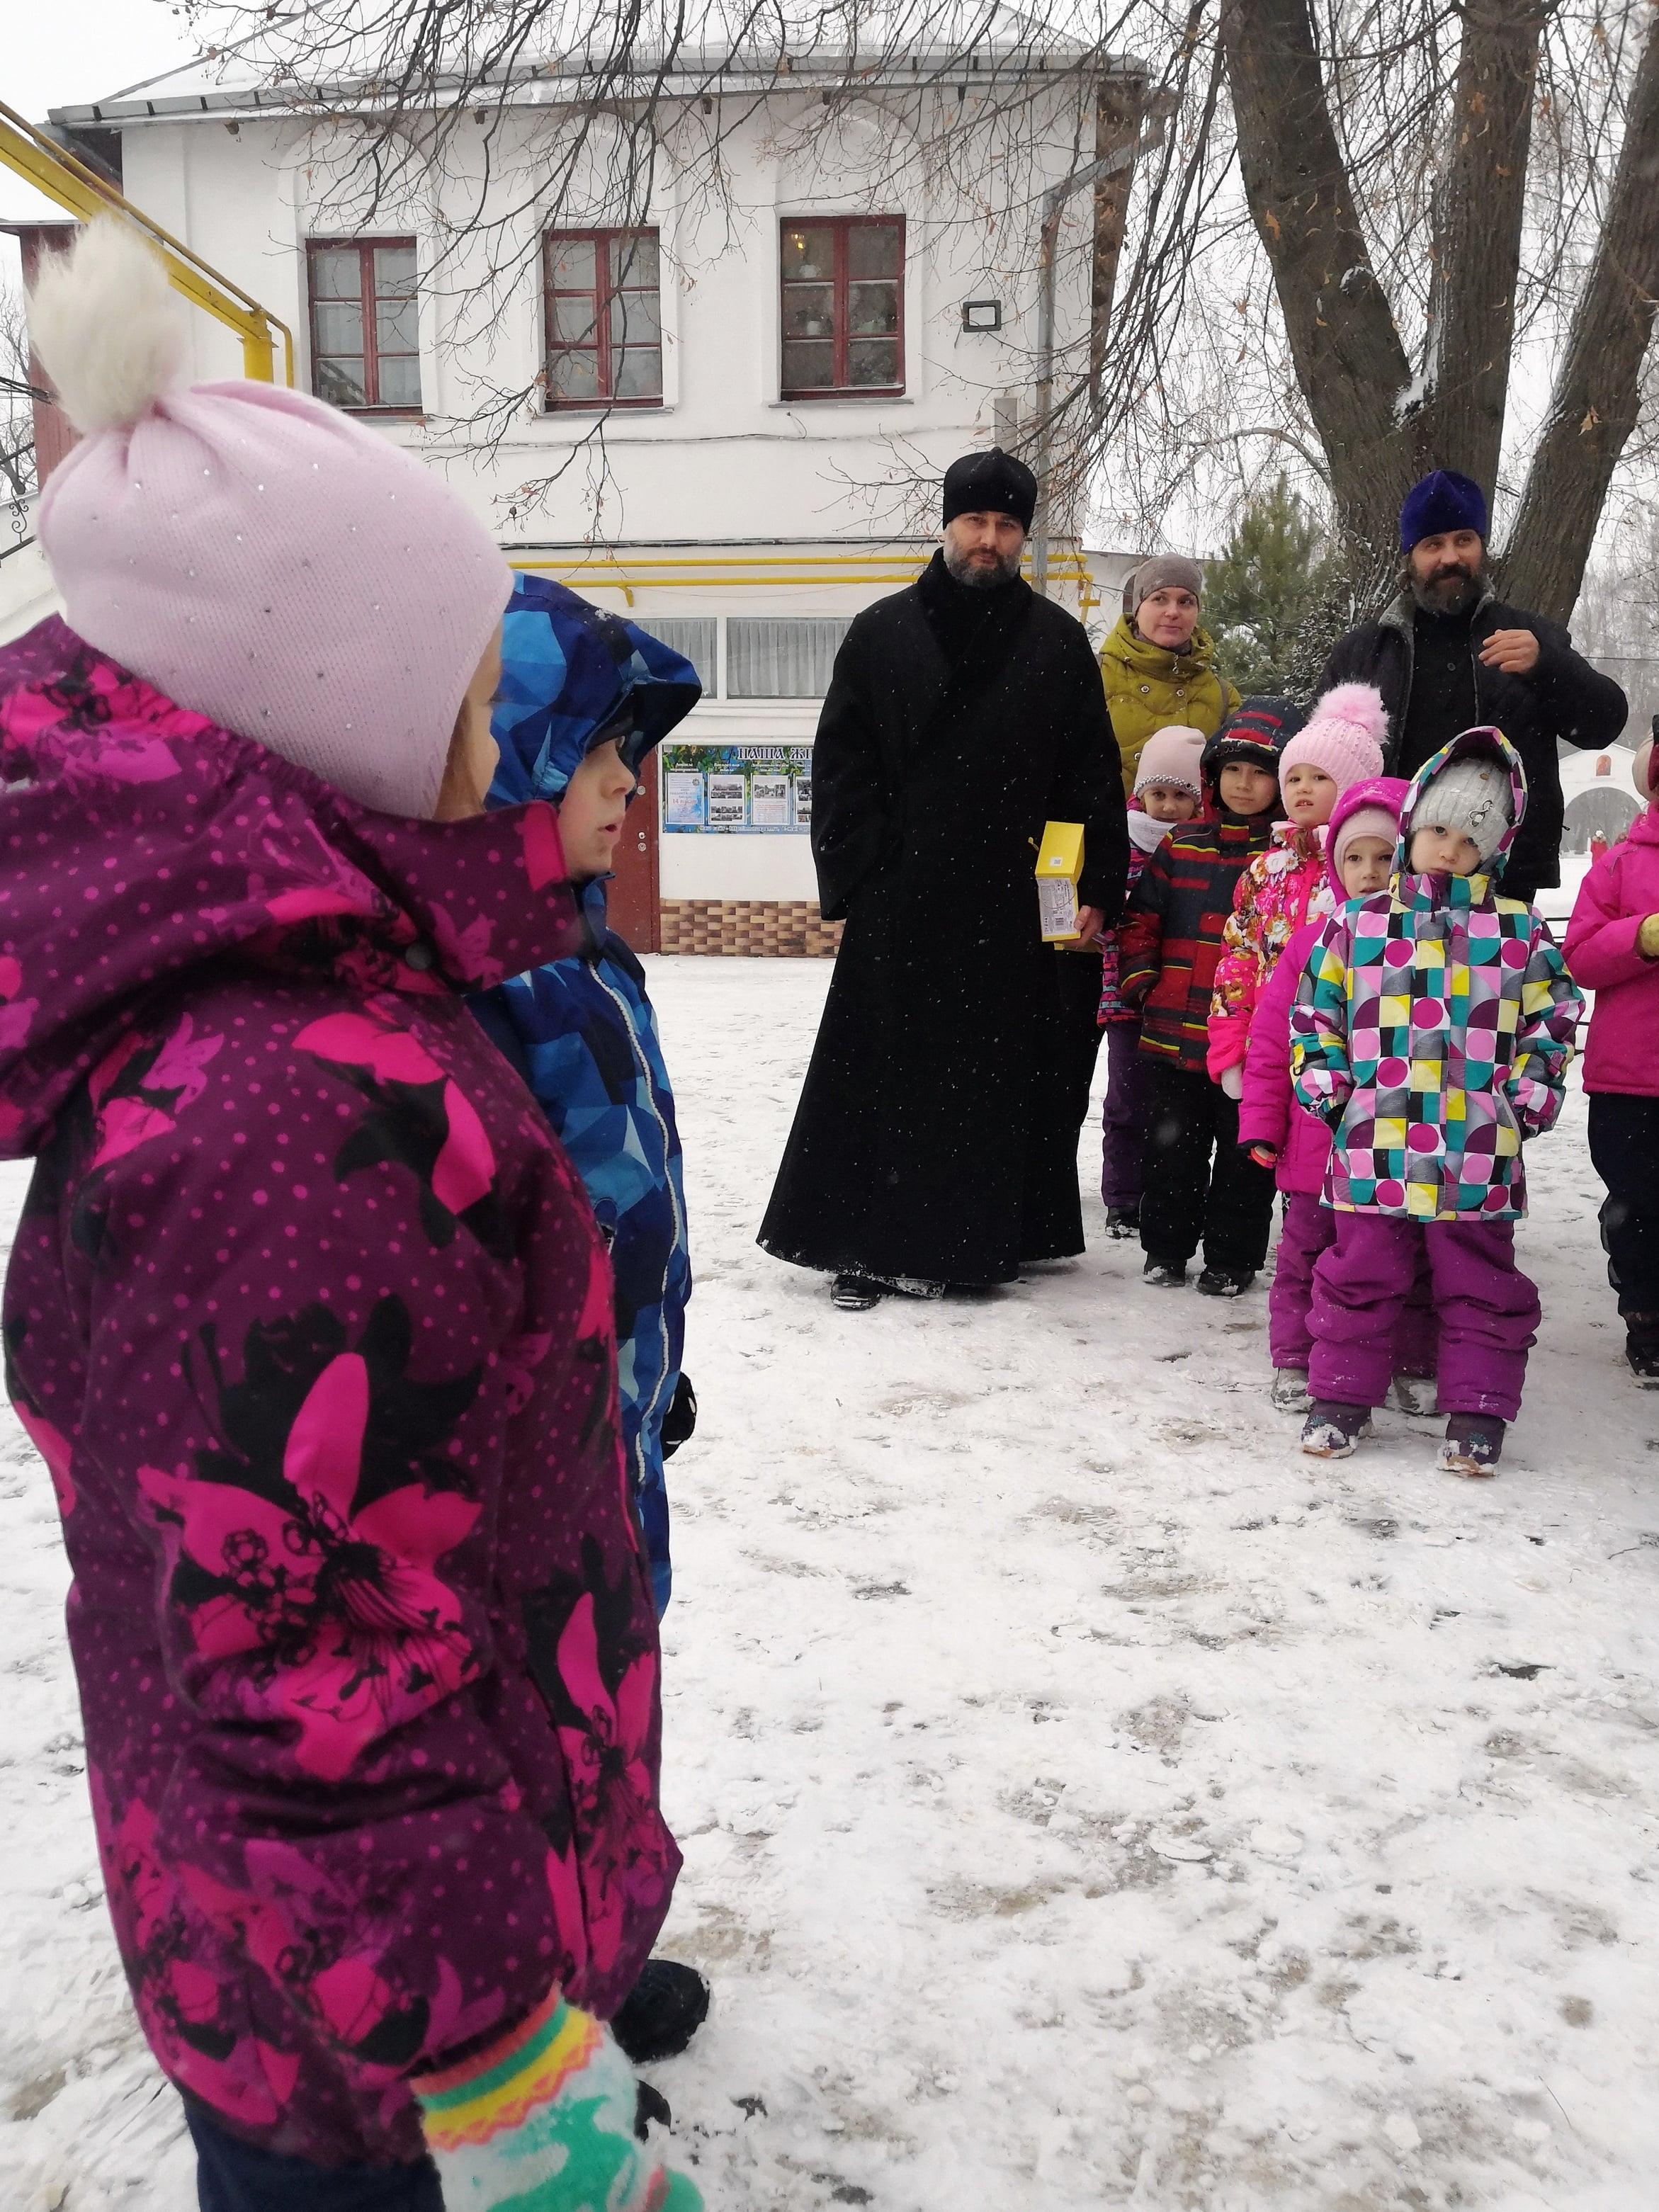 http://monuspen.ru/photoreports/b3aa9199fb88f725c81fb67701ac2ff8.jpg